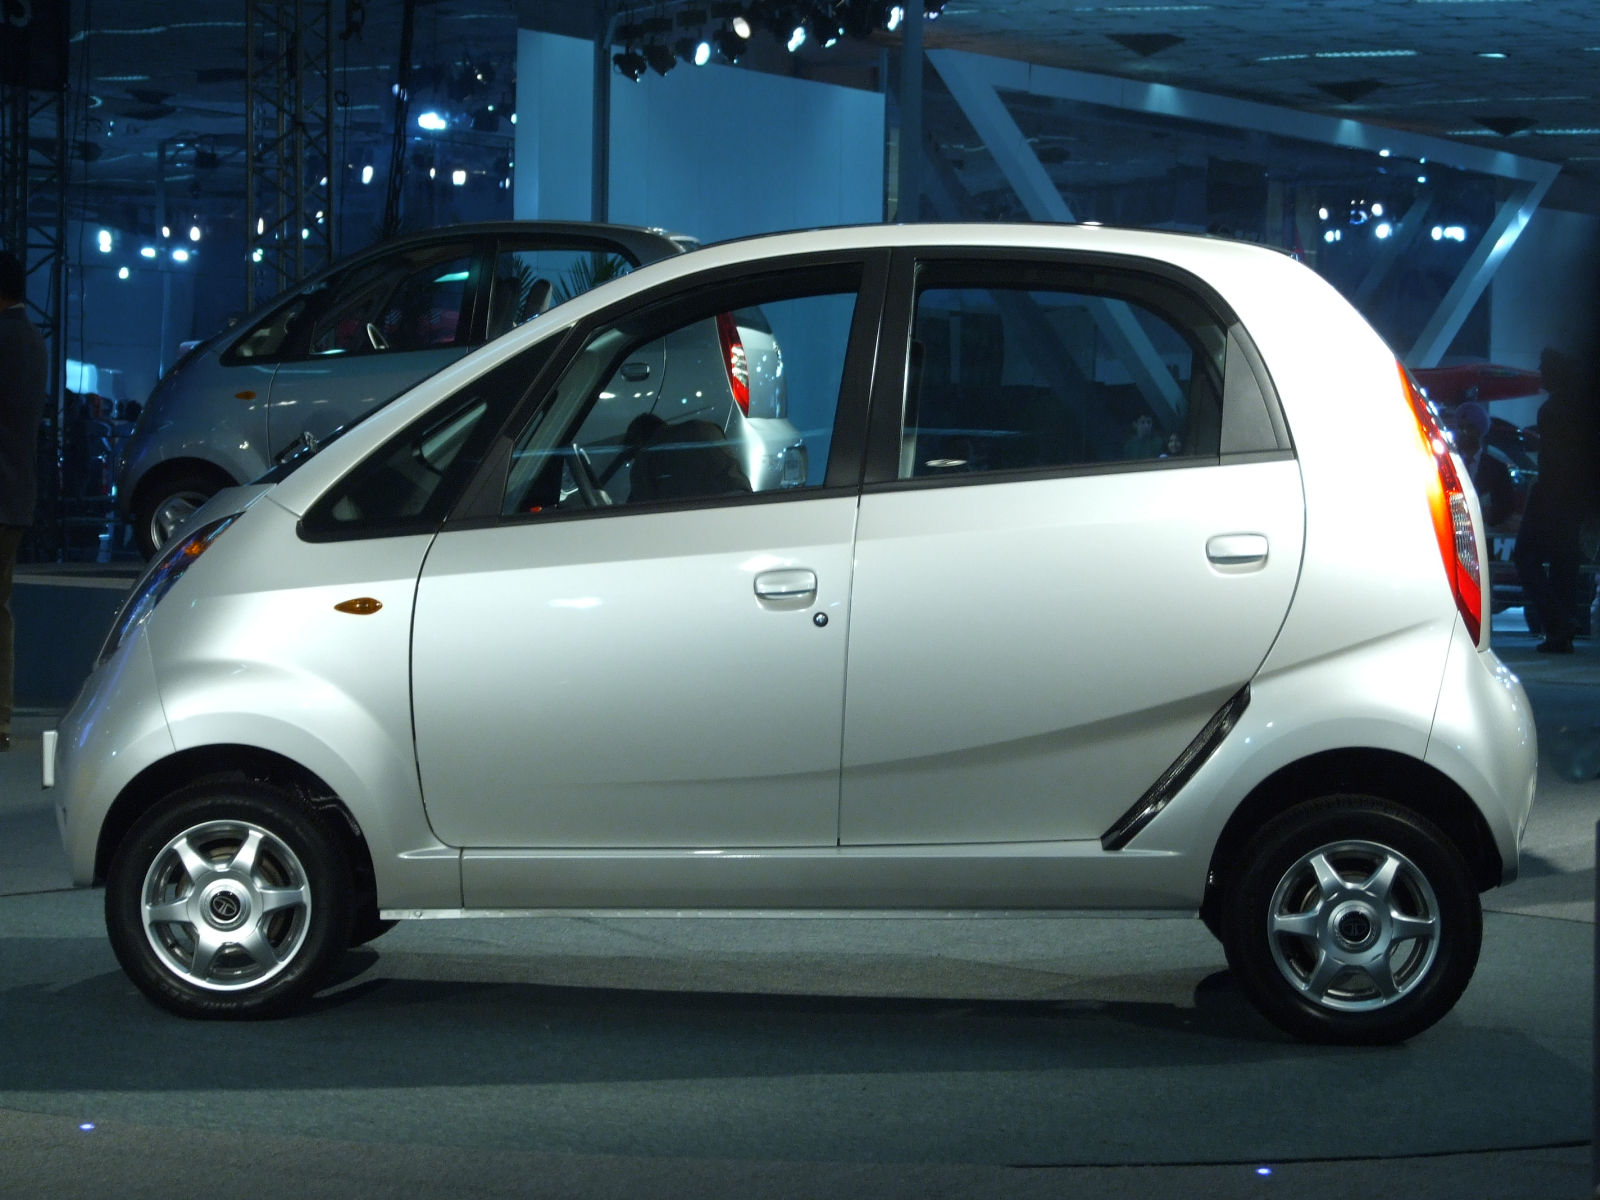 Design of tata nano car - Design Of Tata Nano Car 70